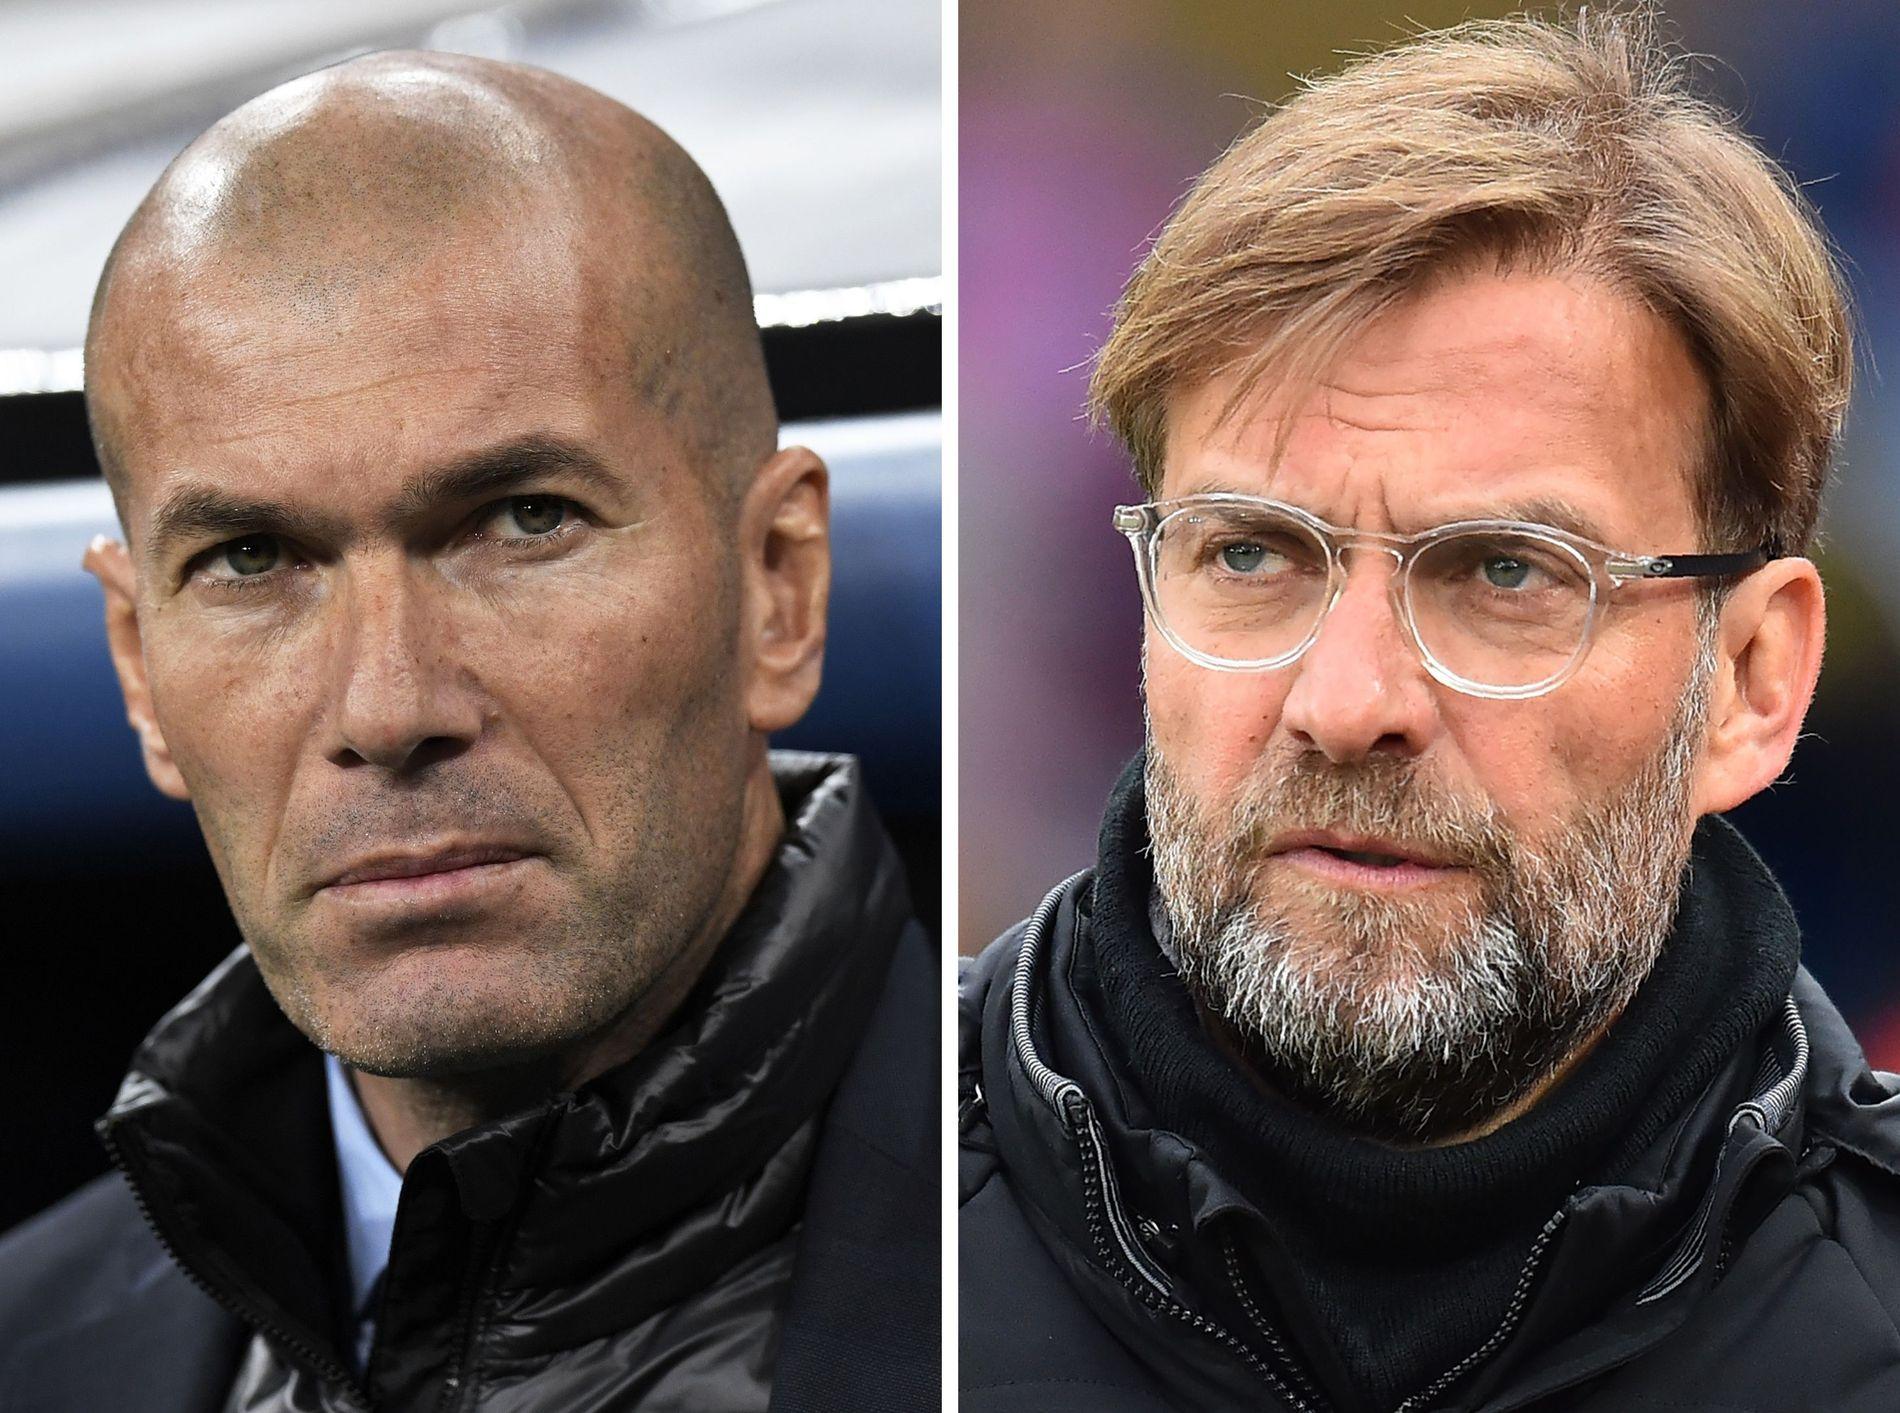 TUNGVEKTER-MØTE: Lørdag møtes Zinédine Zidane (t.v.) og Jürgen Klopp i Champions League-finalen.